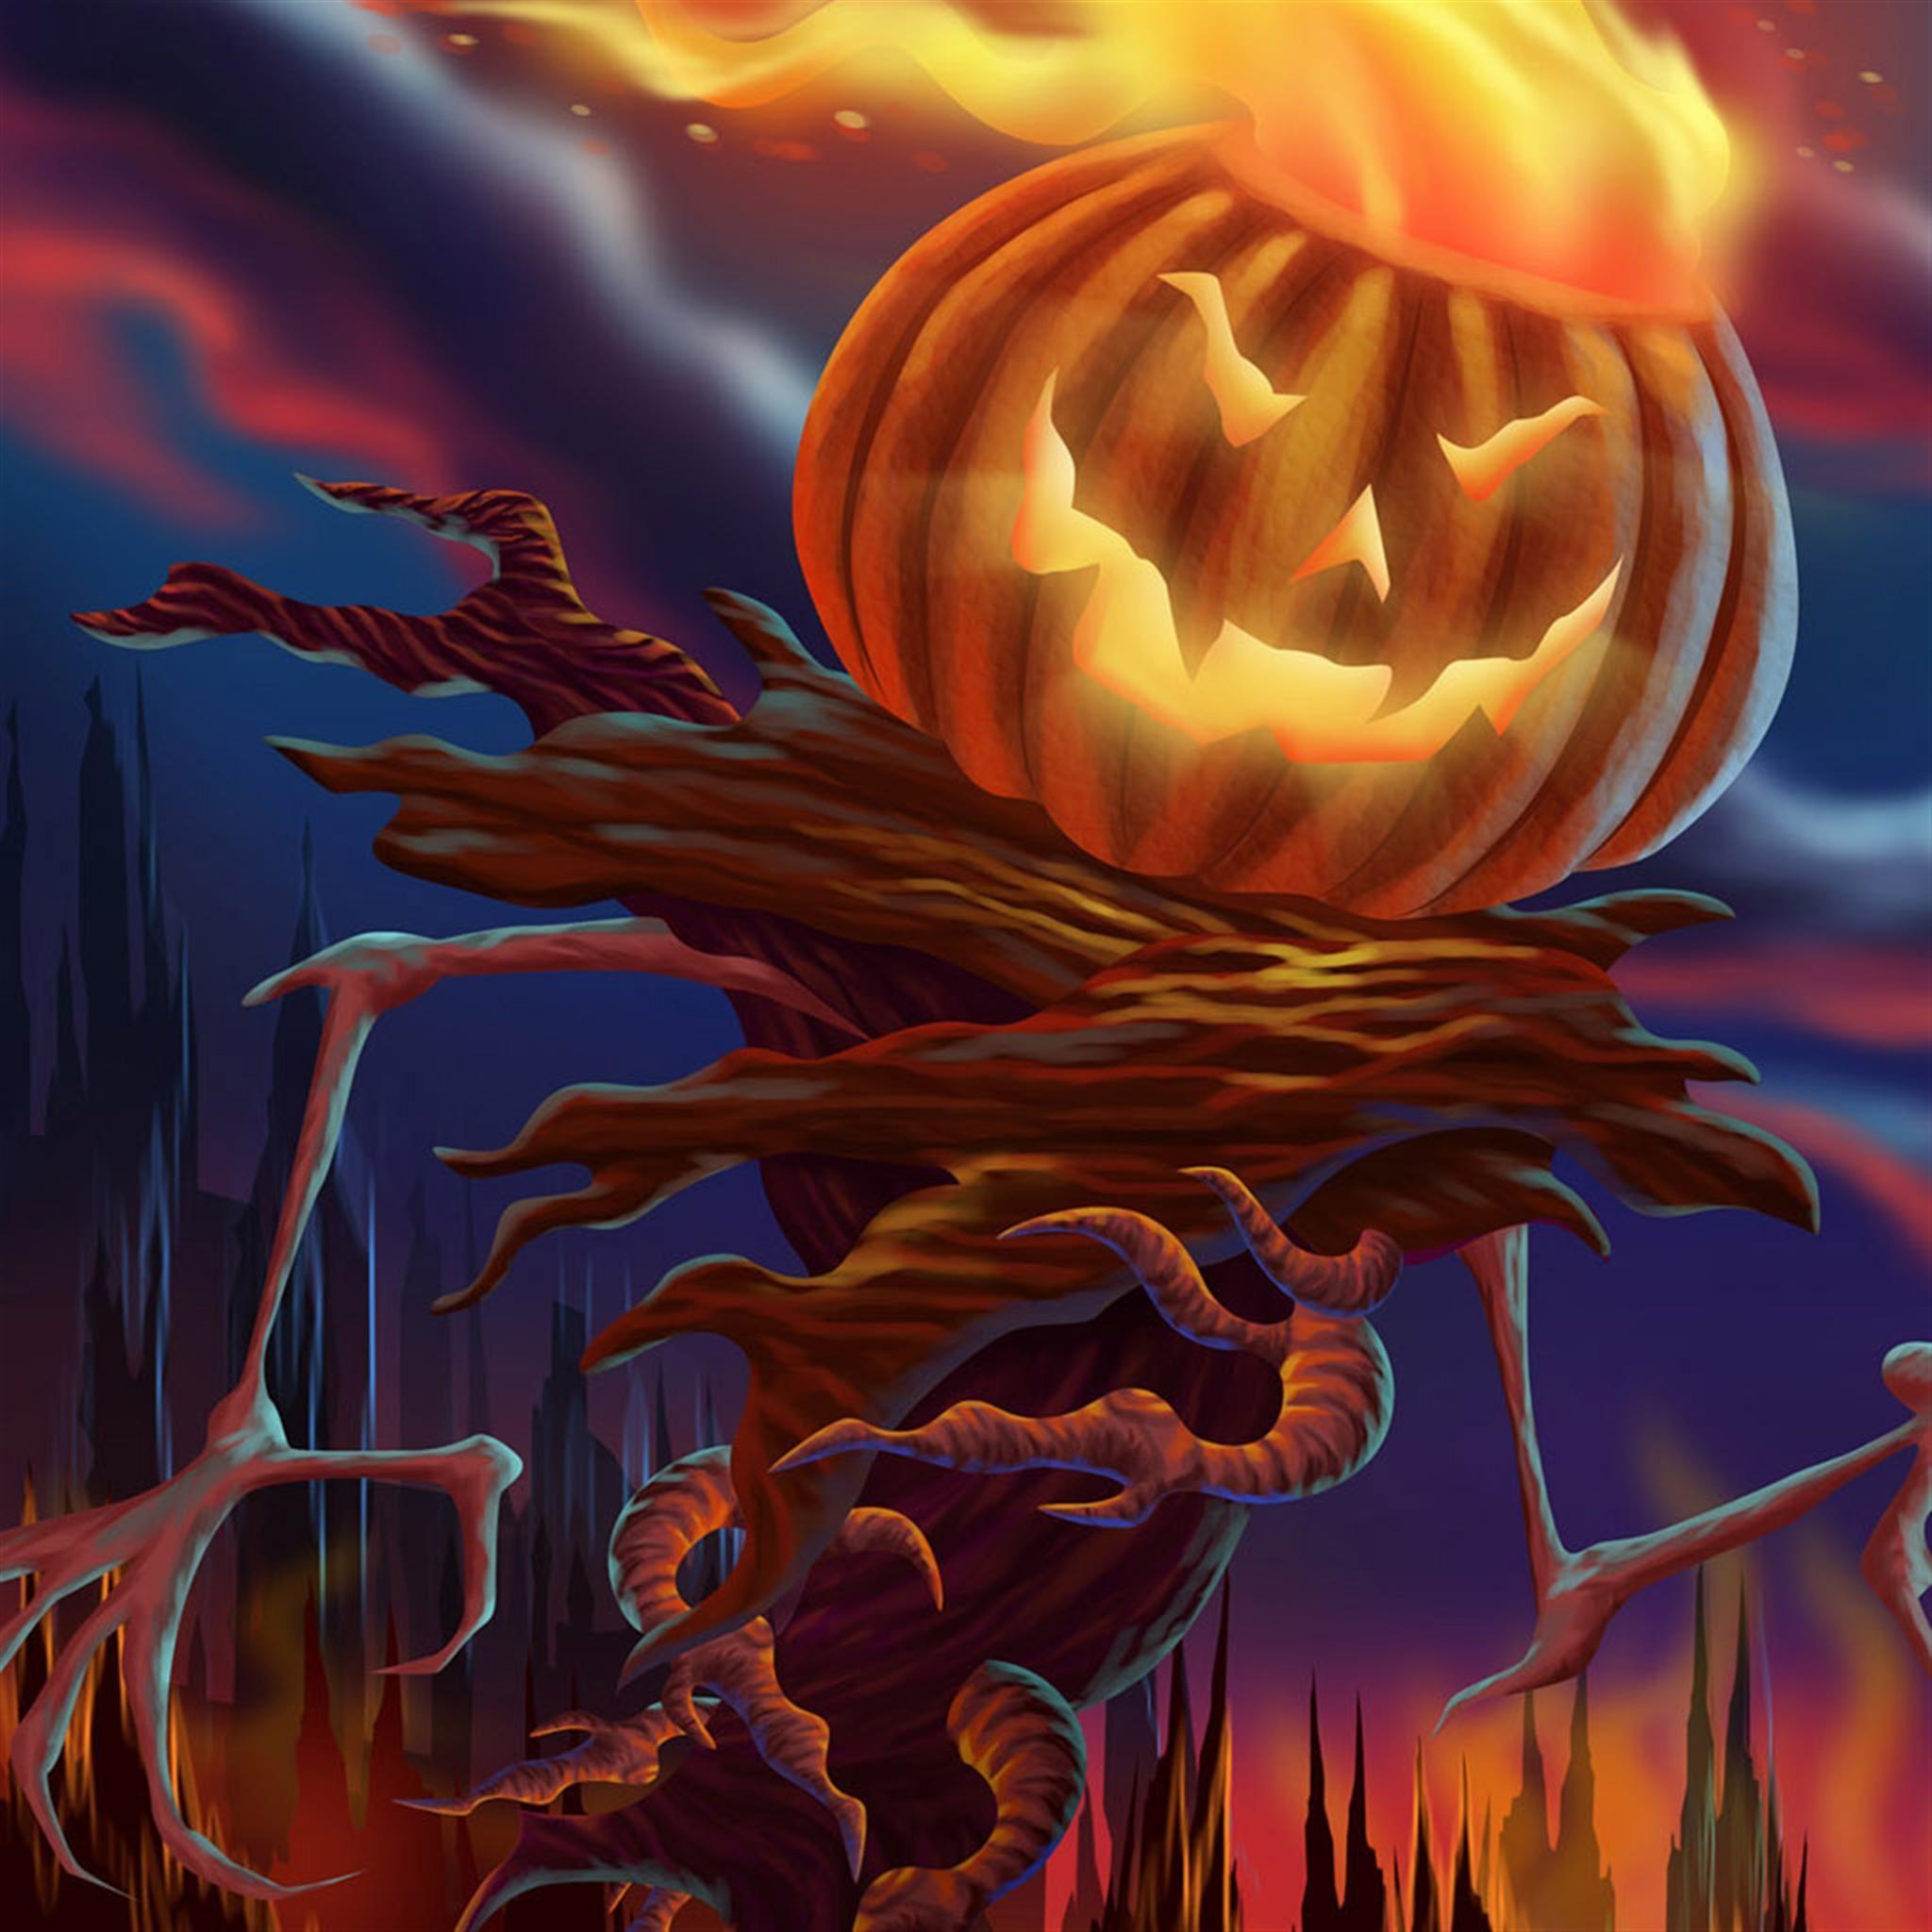 View source image Halloween prints, Halloween images